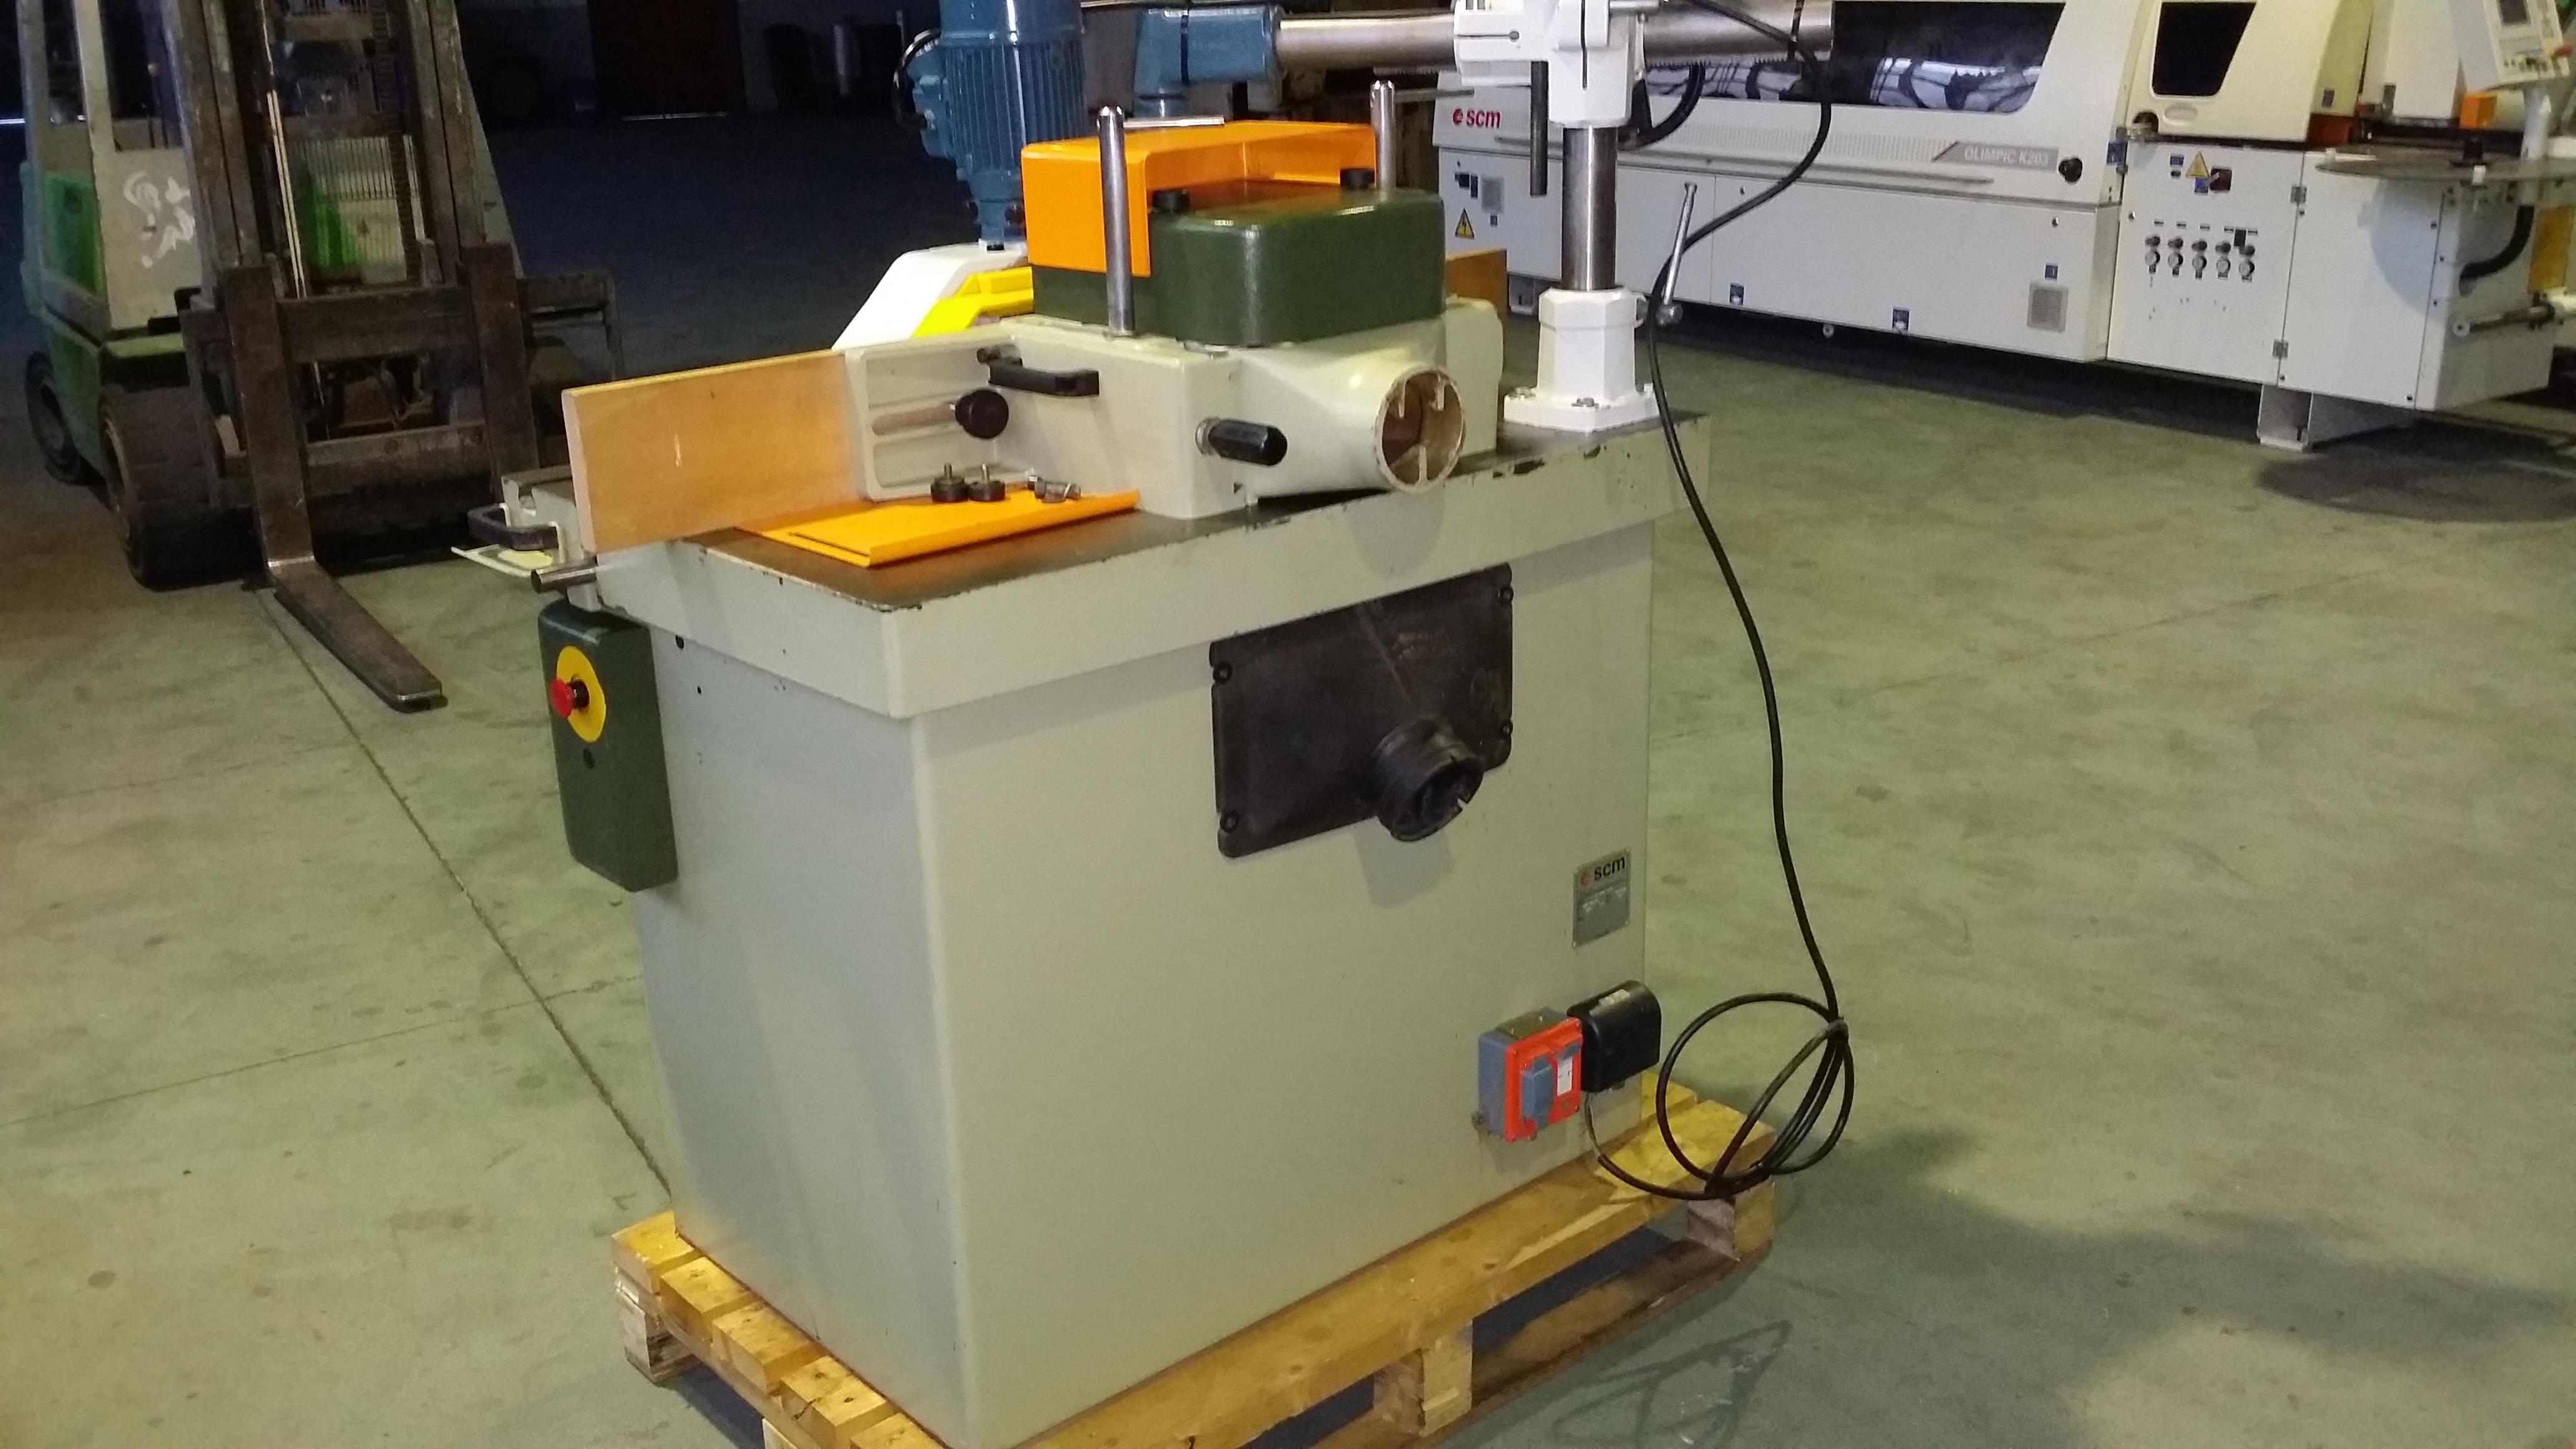 SCM T130 N Spindle moulding machine - Exapro